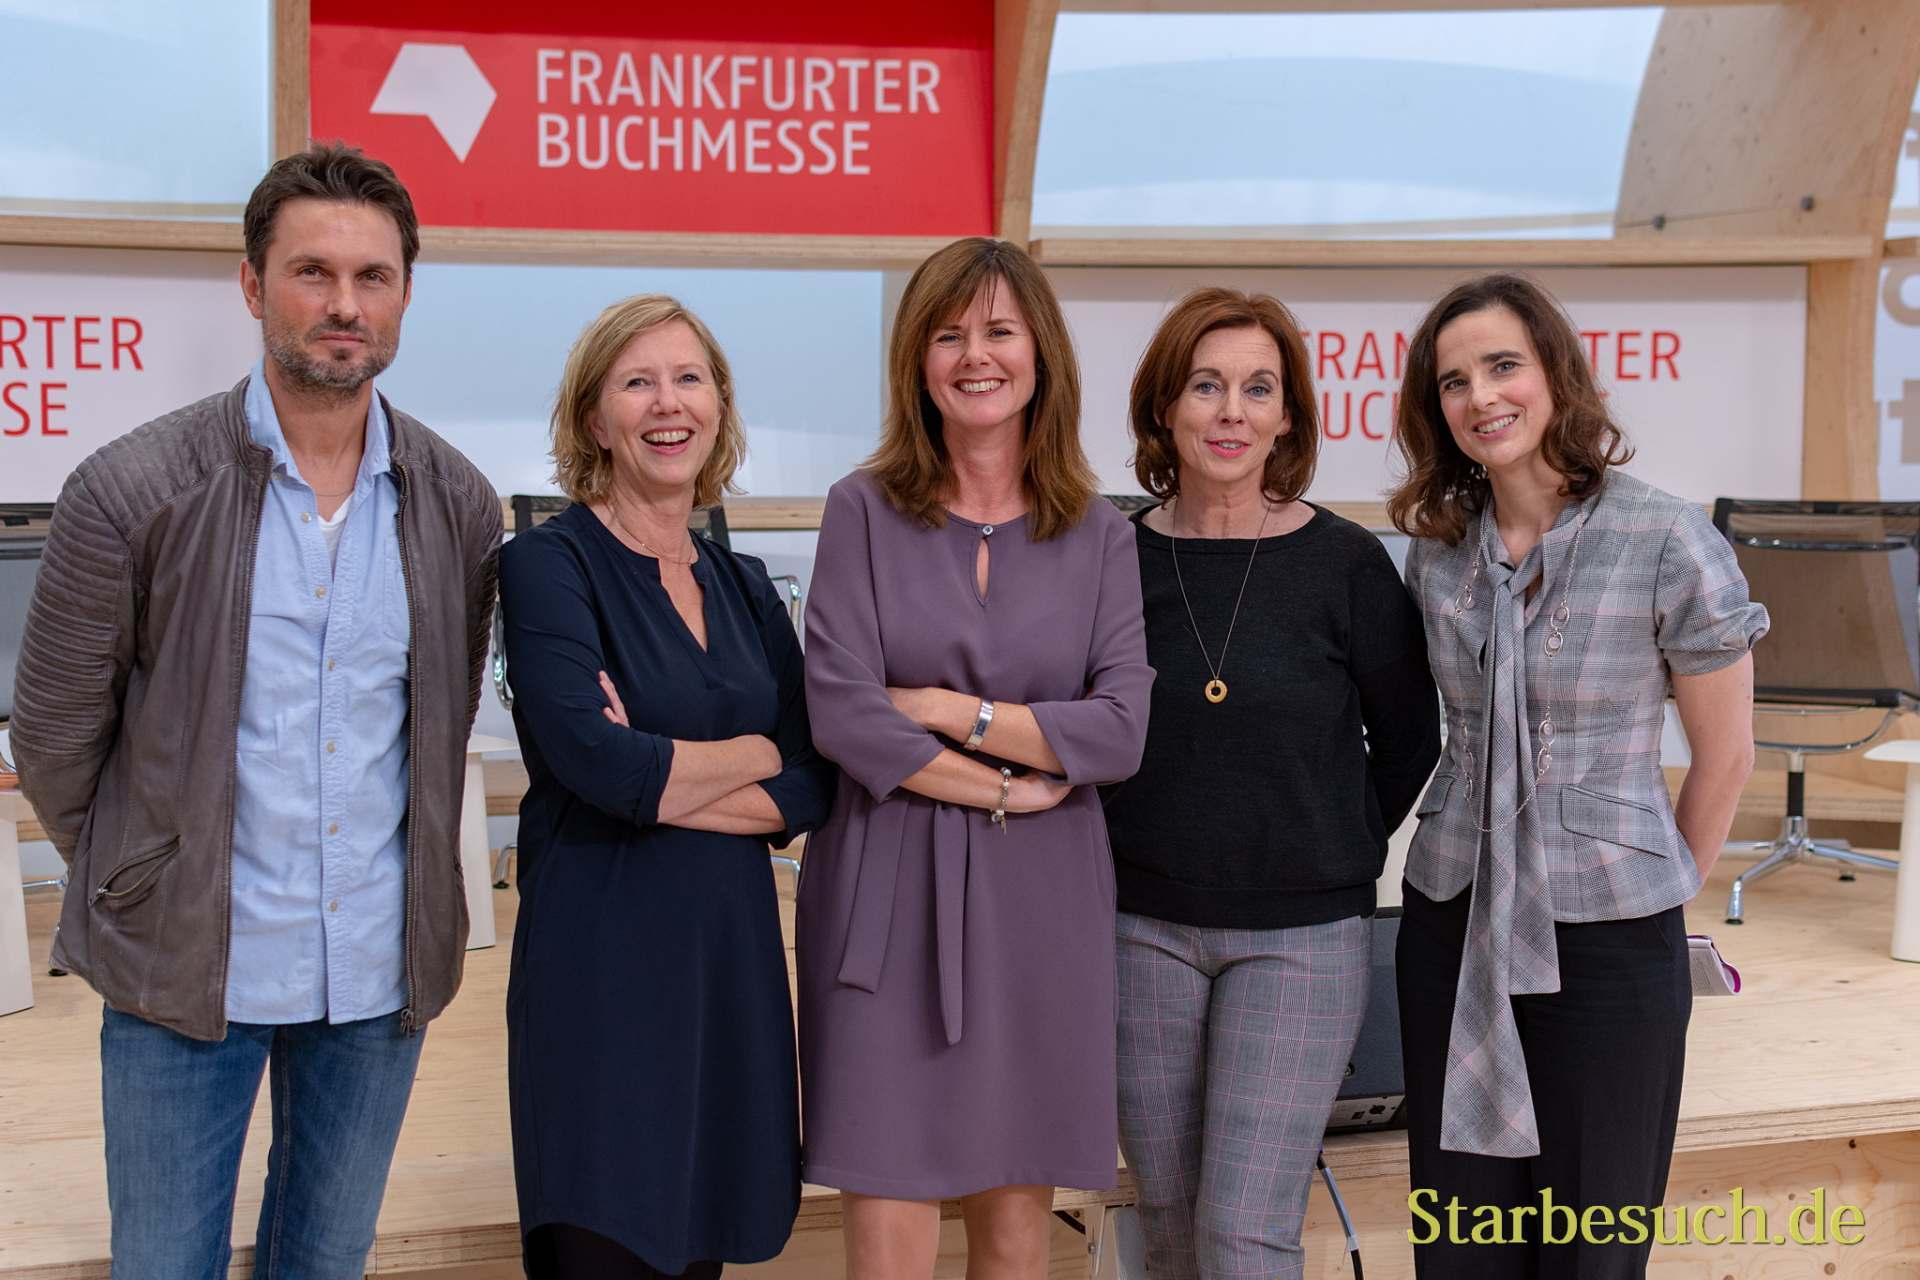 Simon Verhoeven, Petra Zieser, Kerstin Gleba, Britta Sandberg